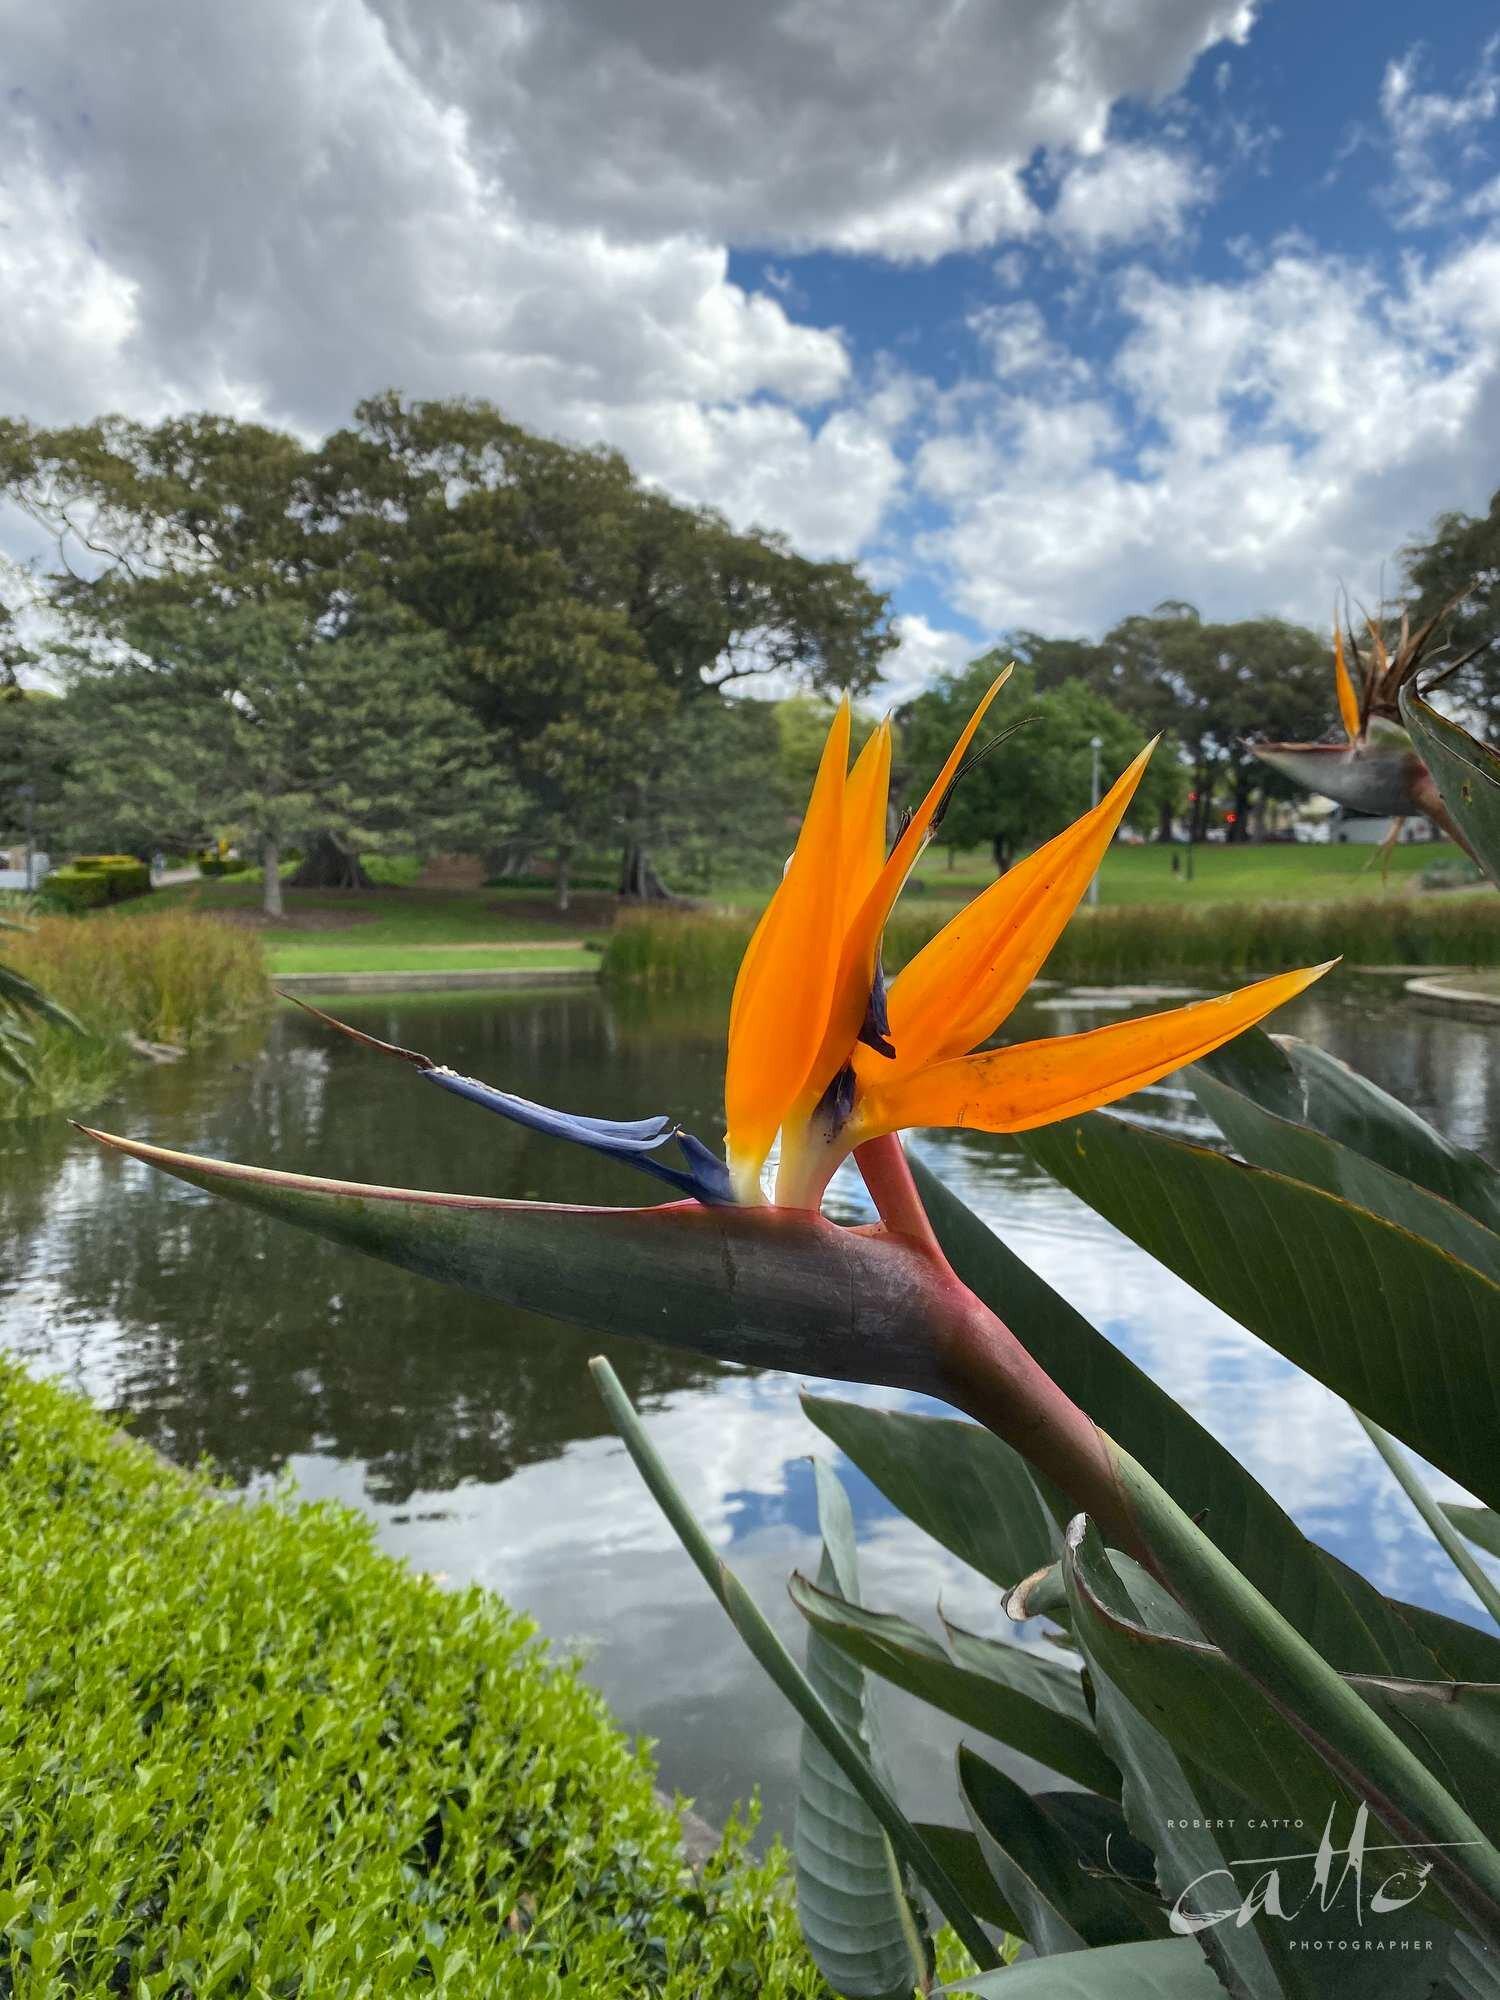 Bird of Paradise flower, Victoria Park, Sydney (iPhone 11 Pro - standard lens)